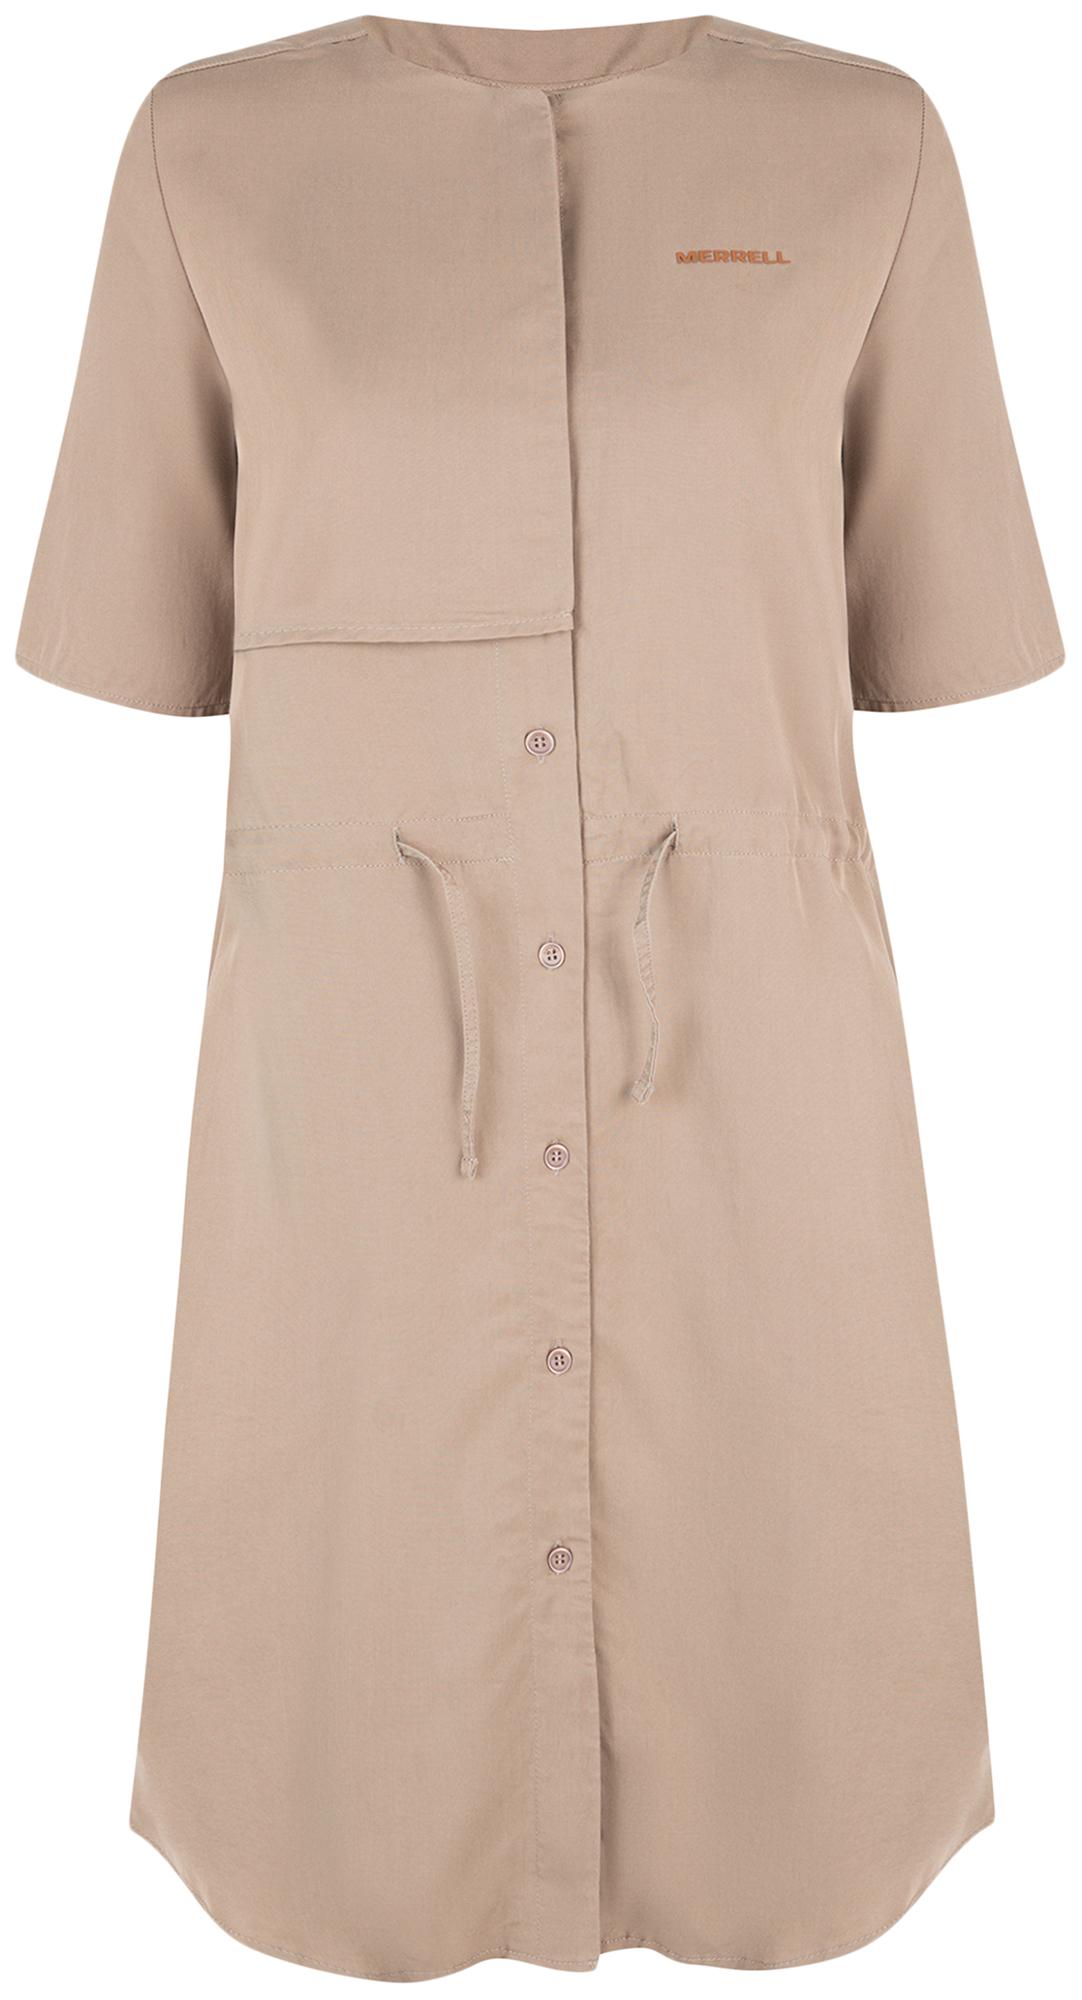 цена на Merrell Платье женское Merrell, размер 42